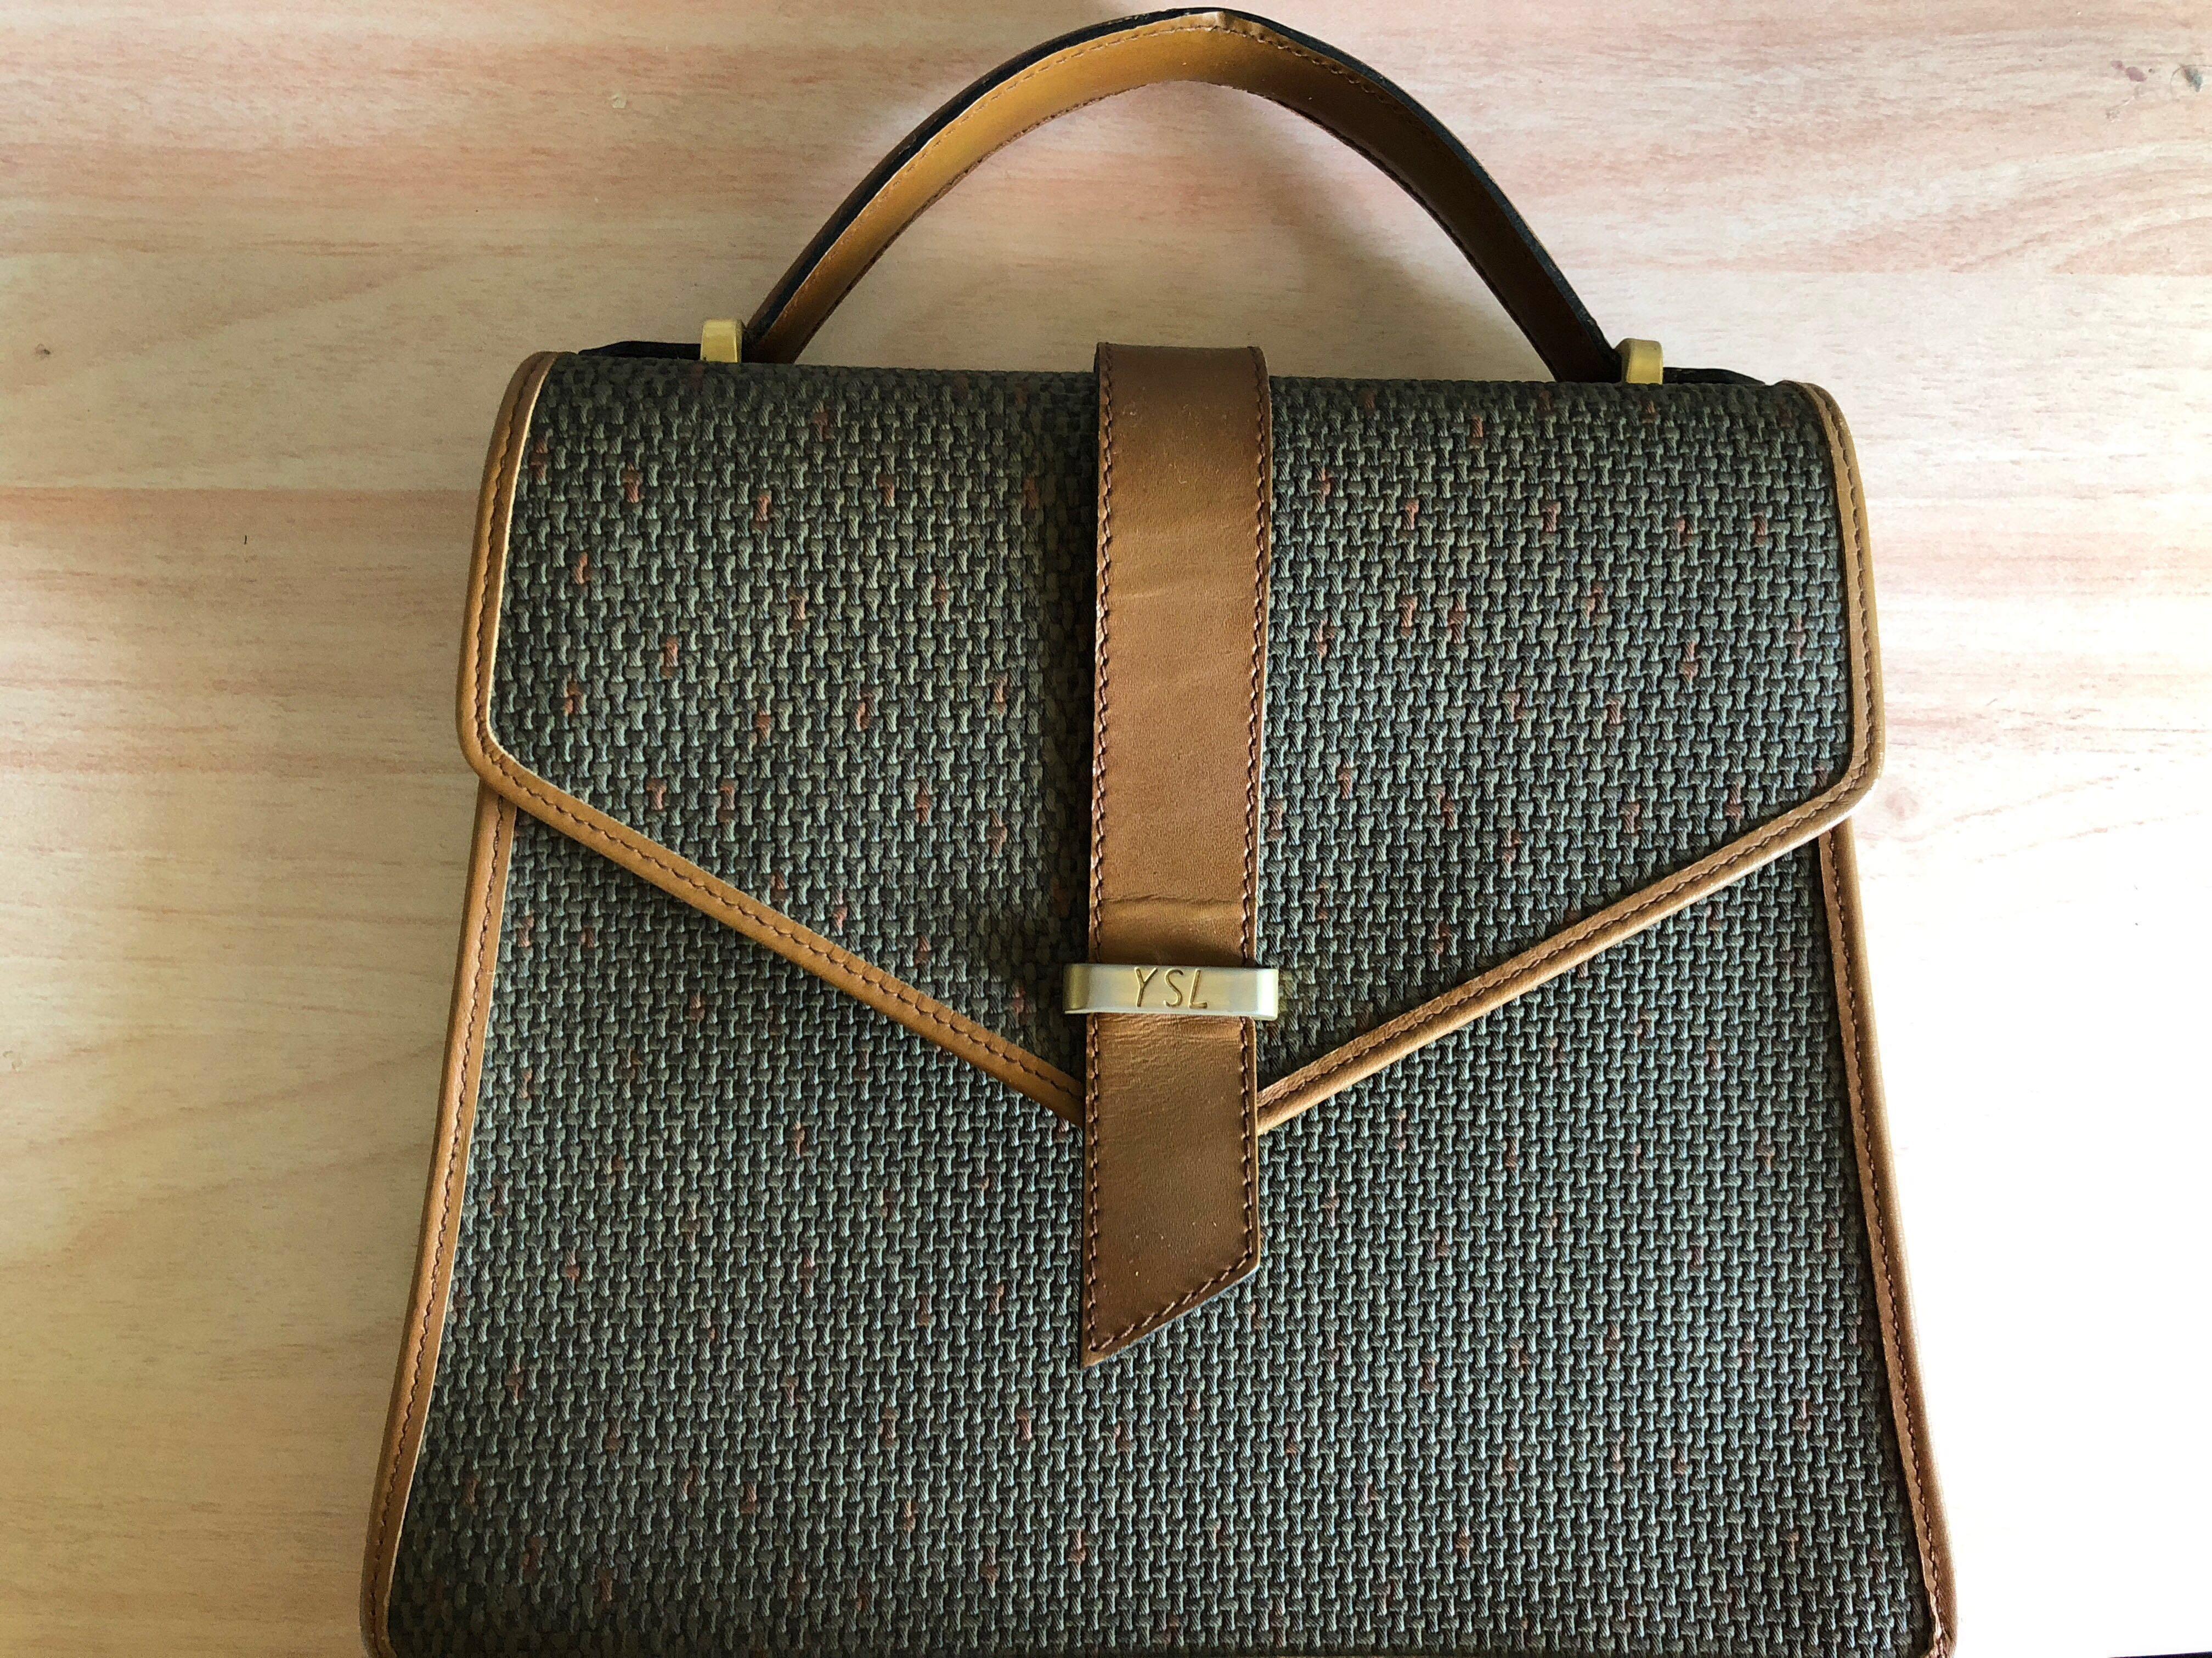 Vintage Ysl Bag Satchel Small Next30 Women S Fashion Bags